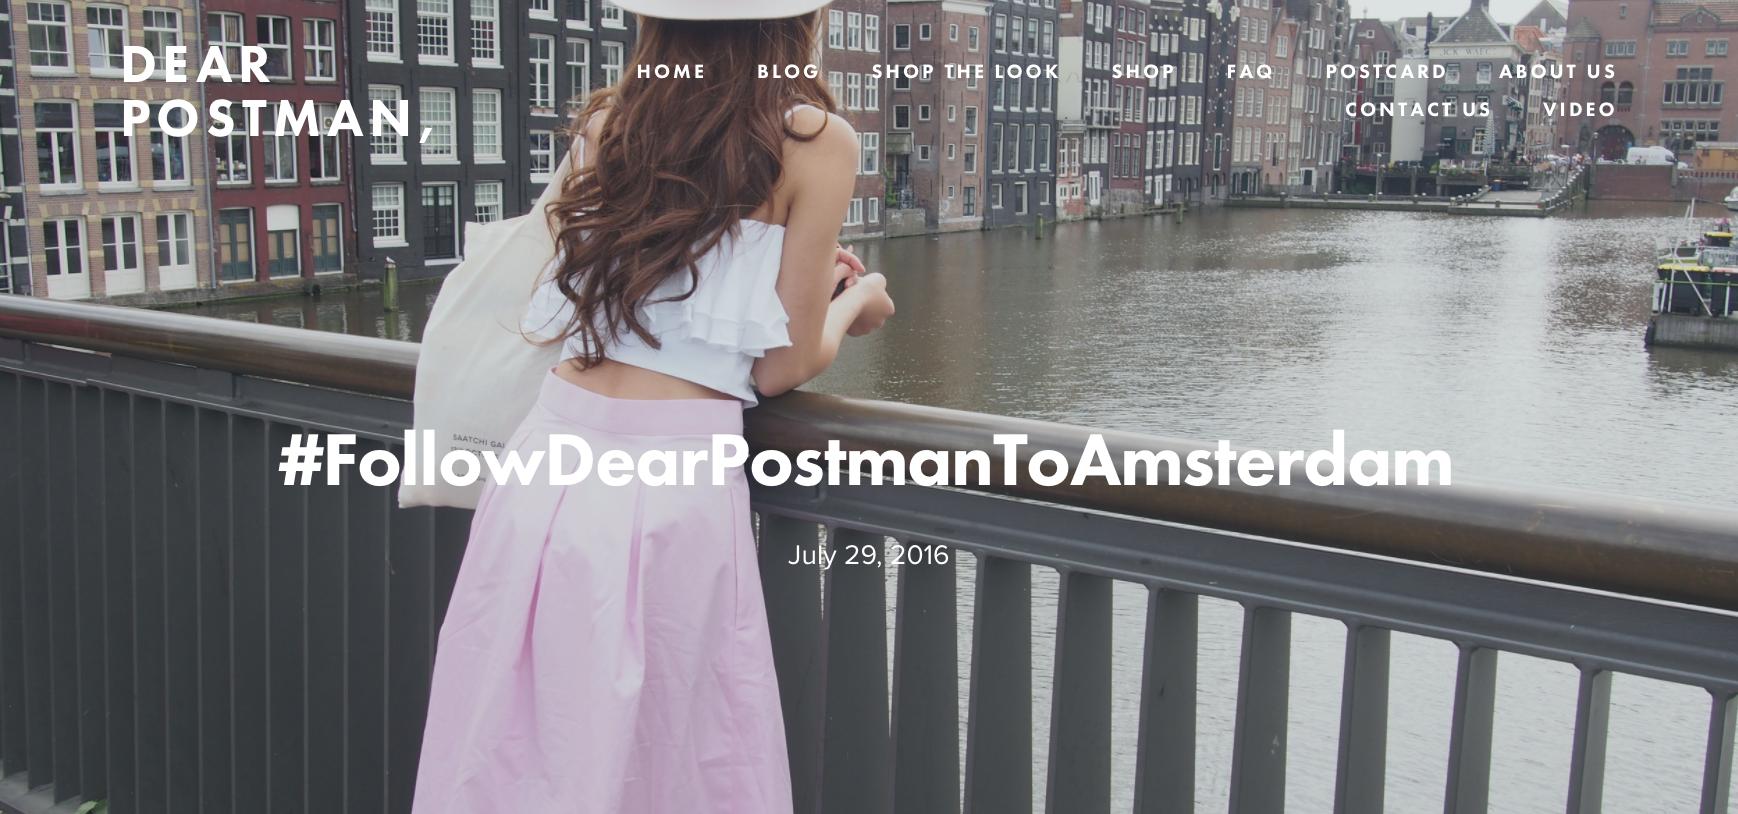 #FollowDearPostmanToAmsterdam